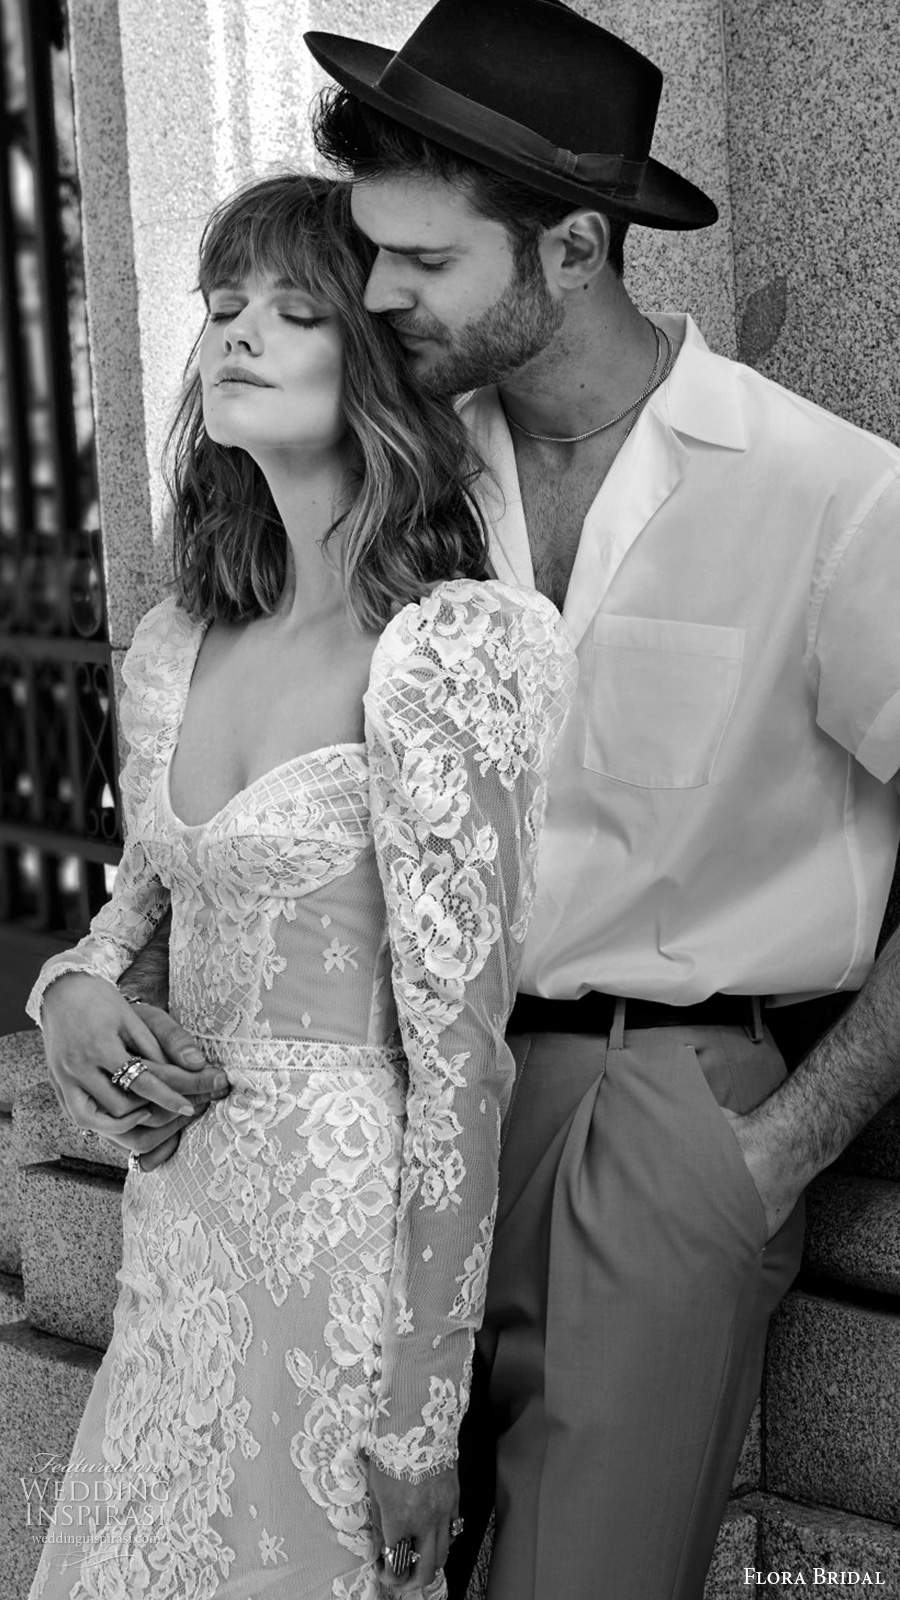 flora bridal 2020 bridal sheer long puff sleeves sweetheart neckline fully embellished lace elegant sheath wedding dress chapel train (10) sv